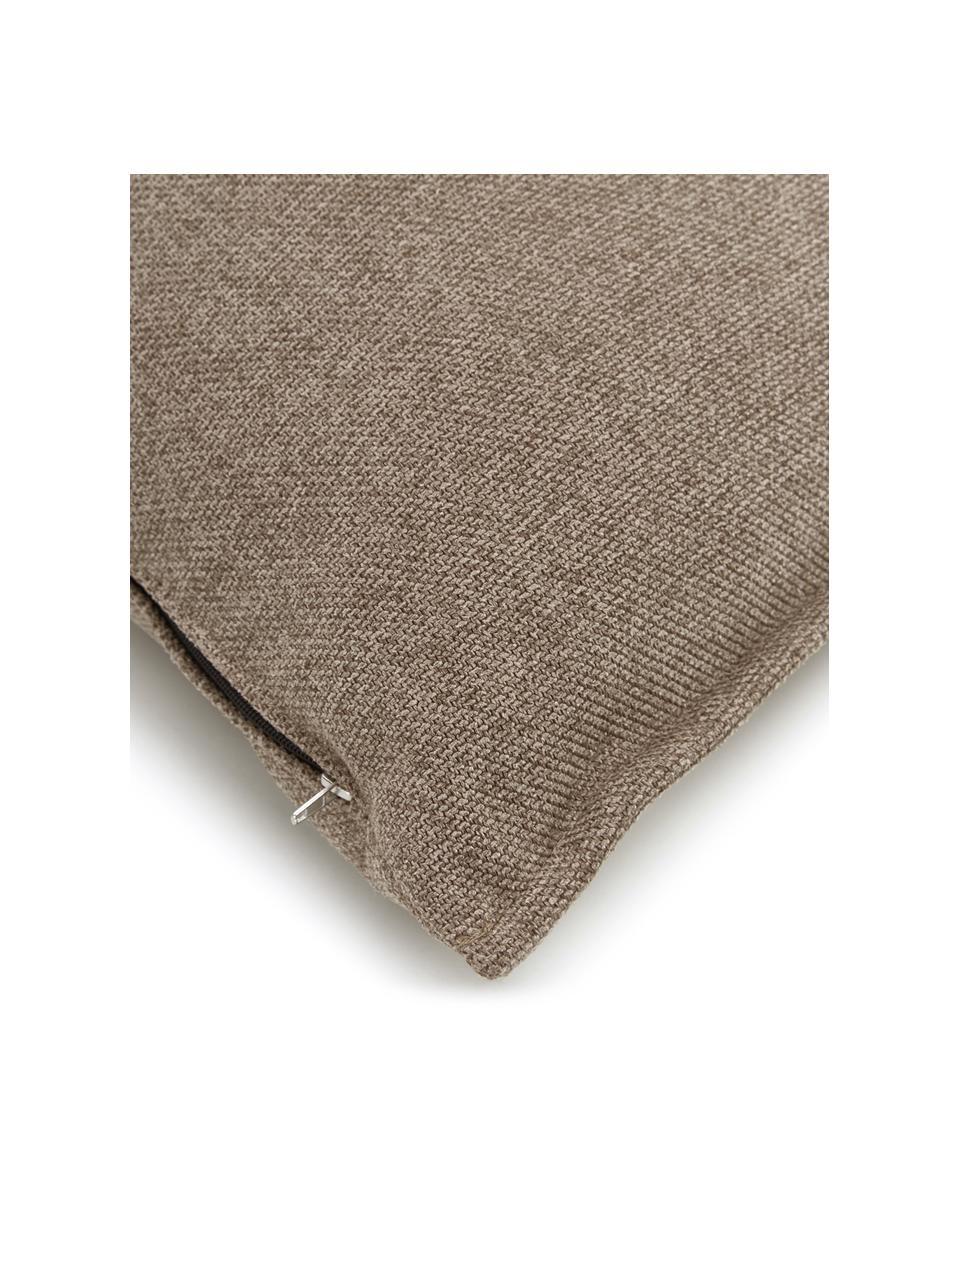 Sofa-Kissen Lennon in Braun, Bezug: 100% Polyester, Webstoff Braun, 60 x 60 cm